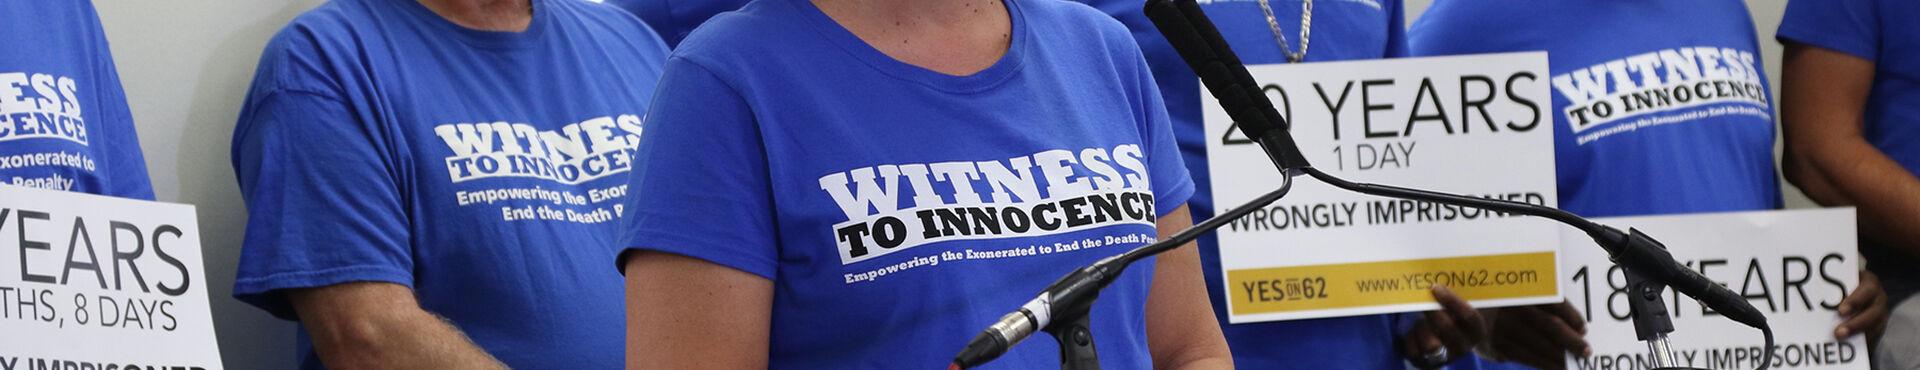 Banner - Witness to Innocence